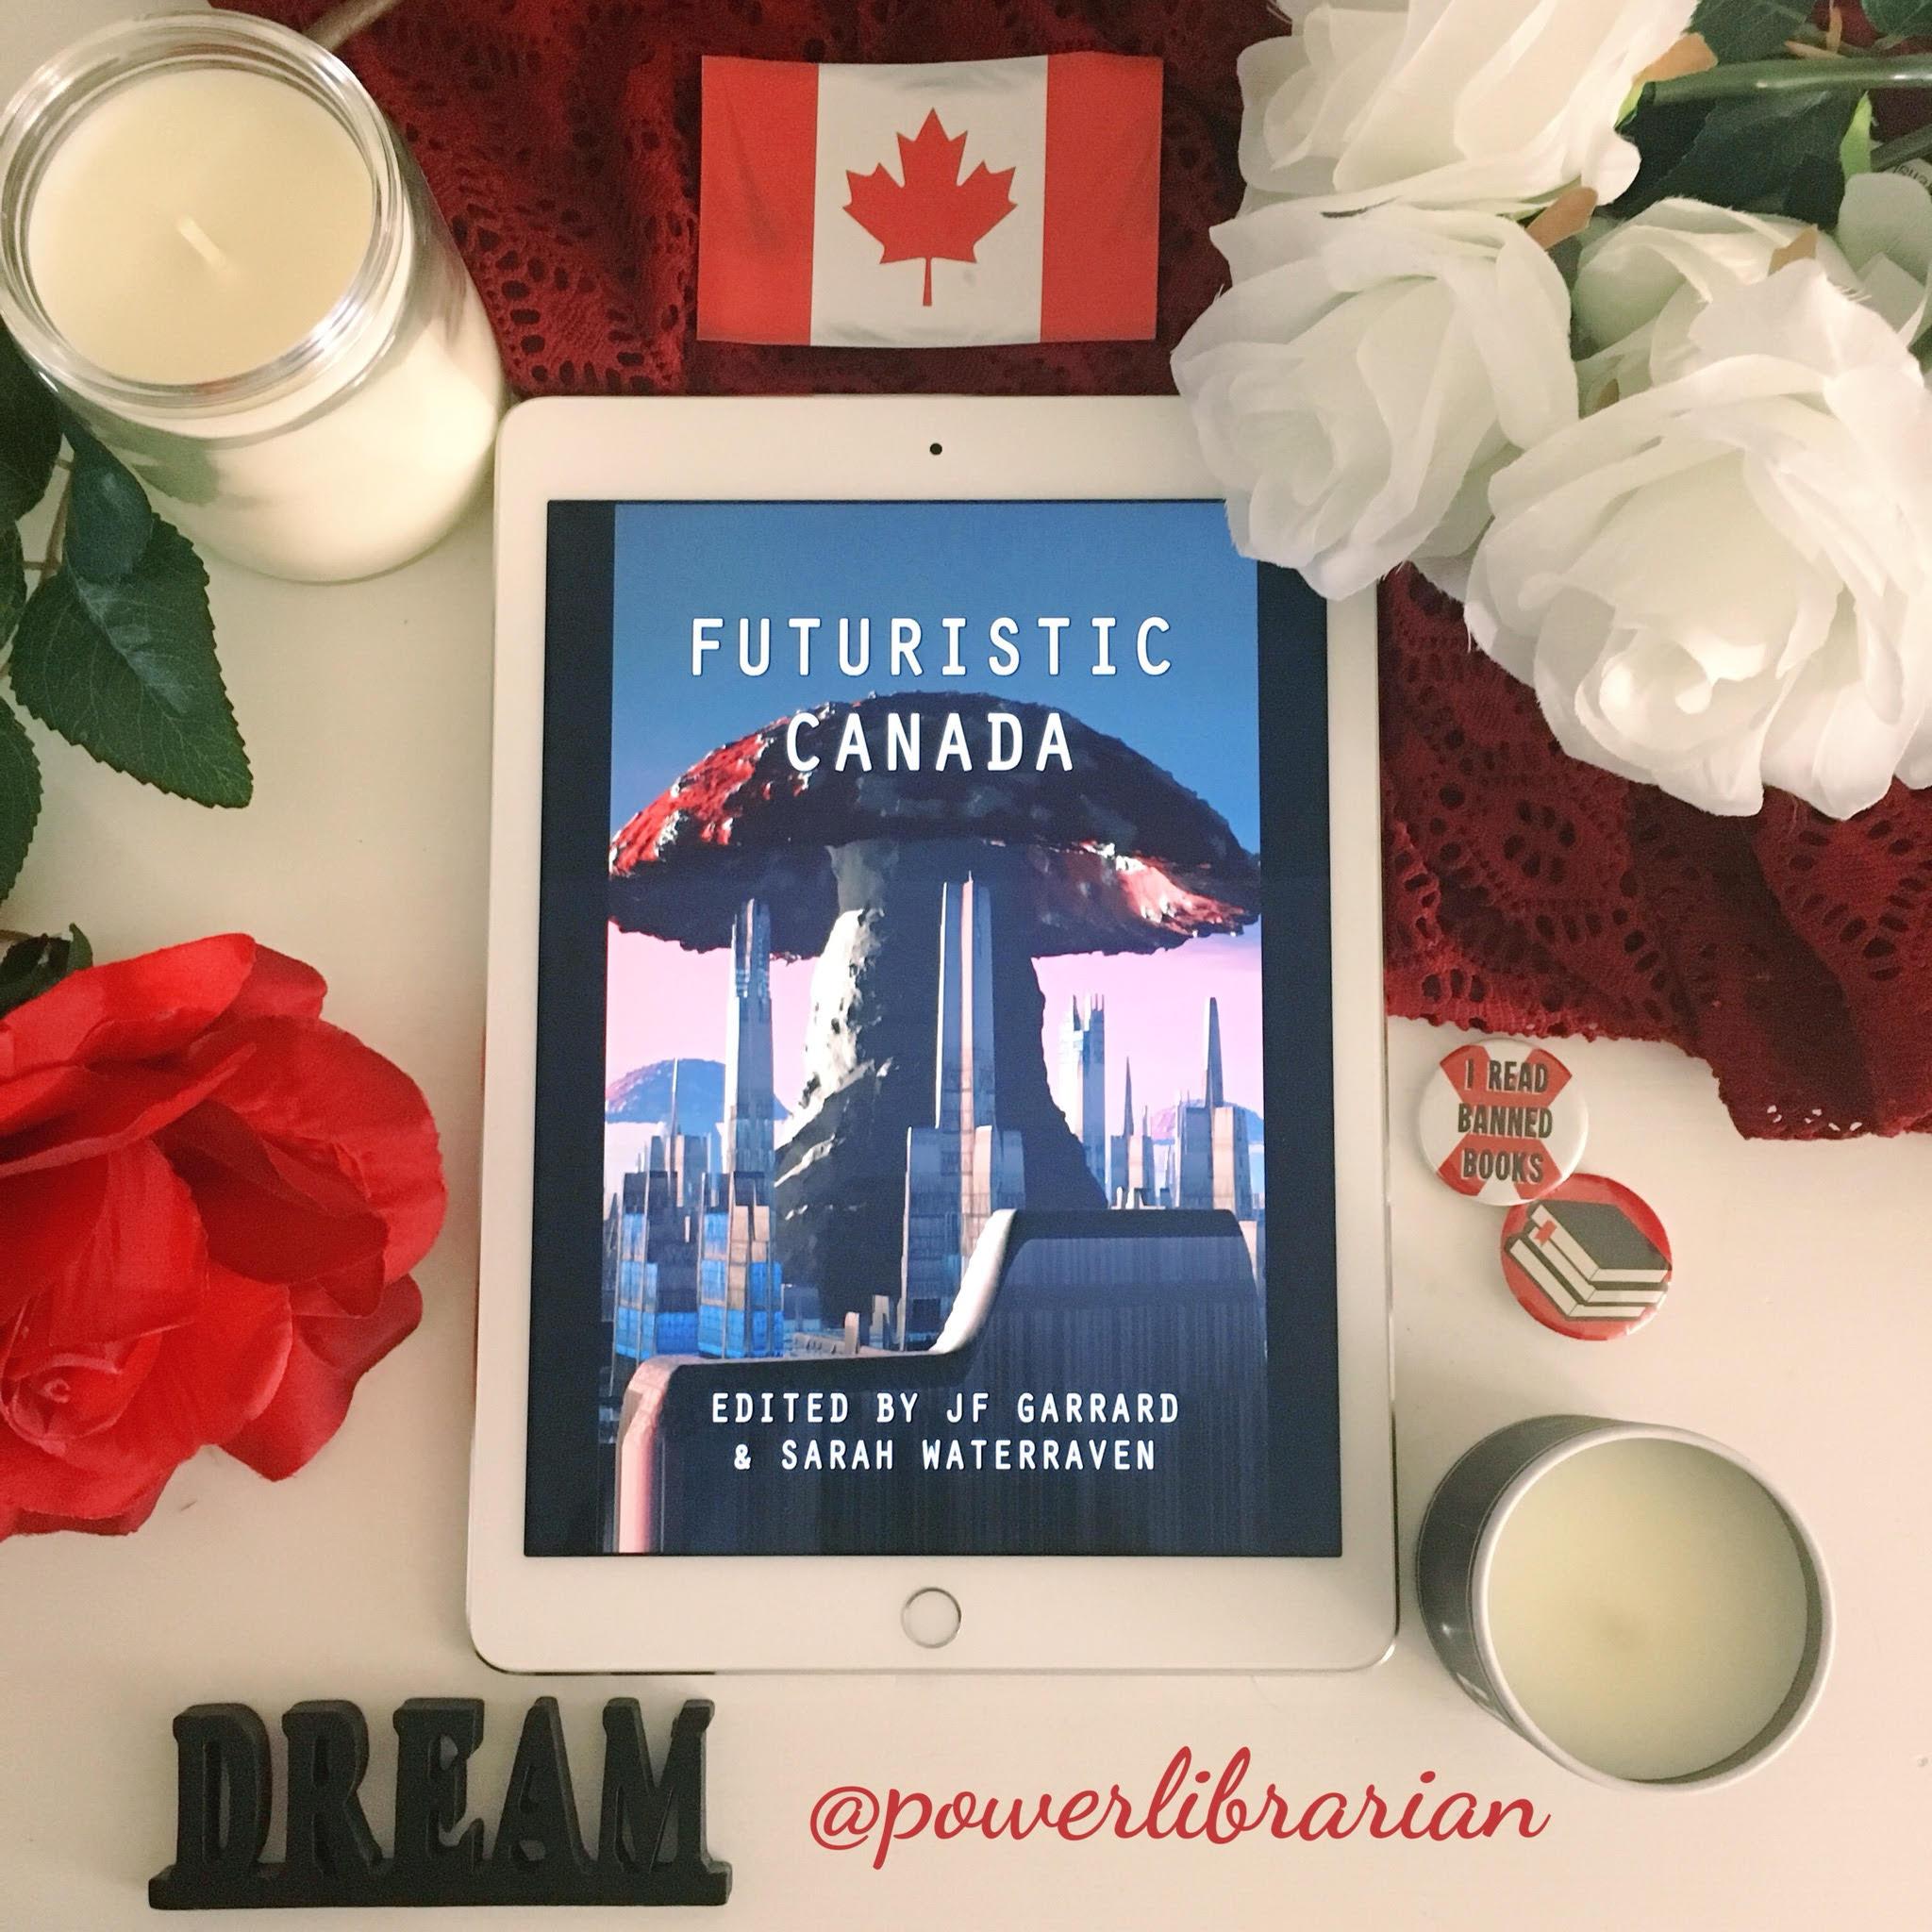 Futuristic Canada Anthology released